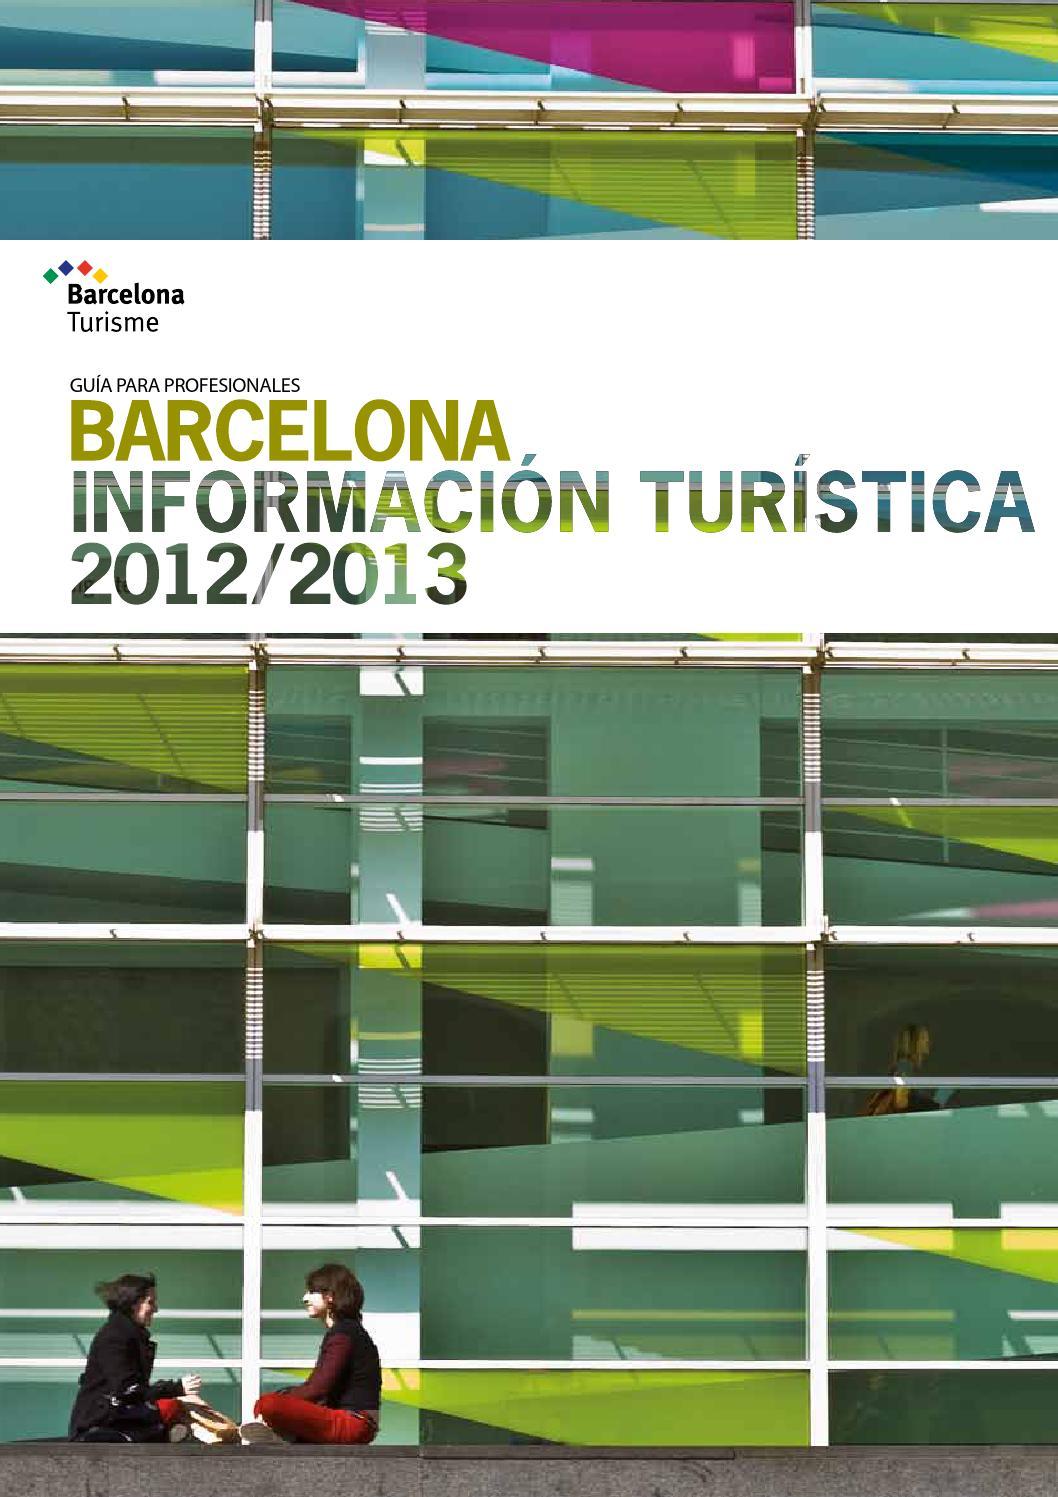 0fc520156e88 BARCELONA INFORMACIÓN TURÍSTICA 2012-2013 by Visitasparati - issuu